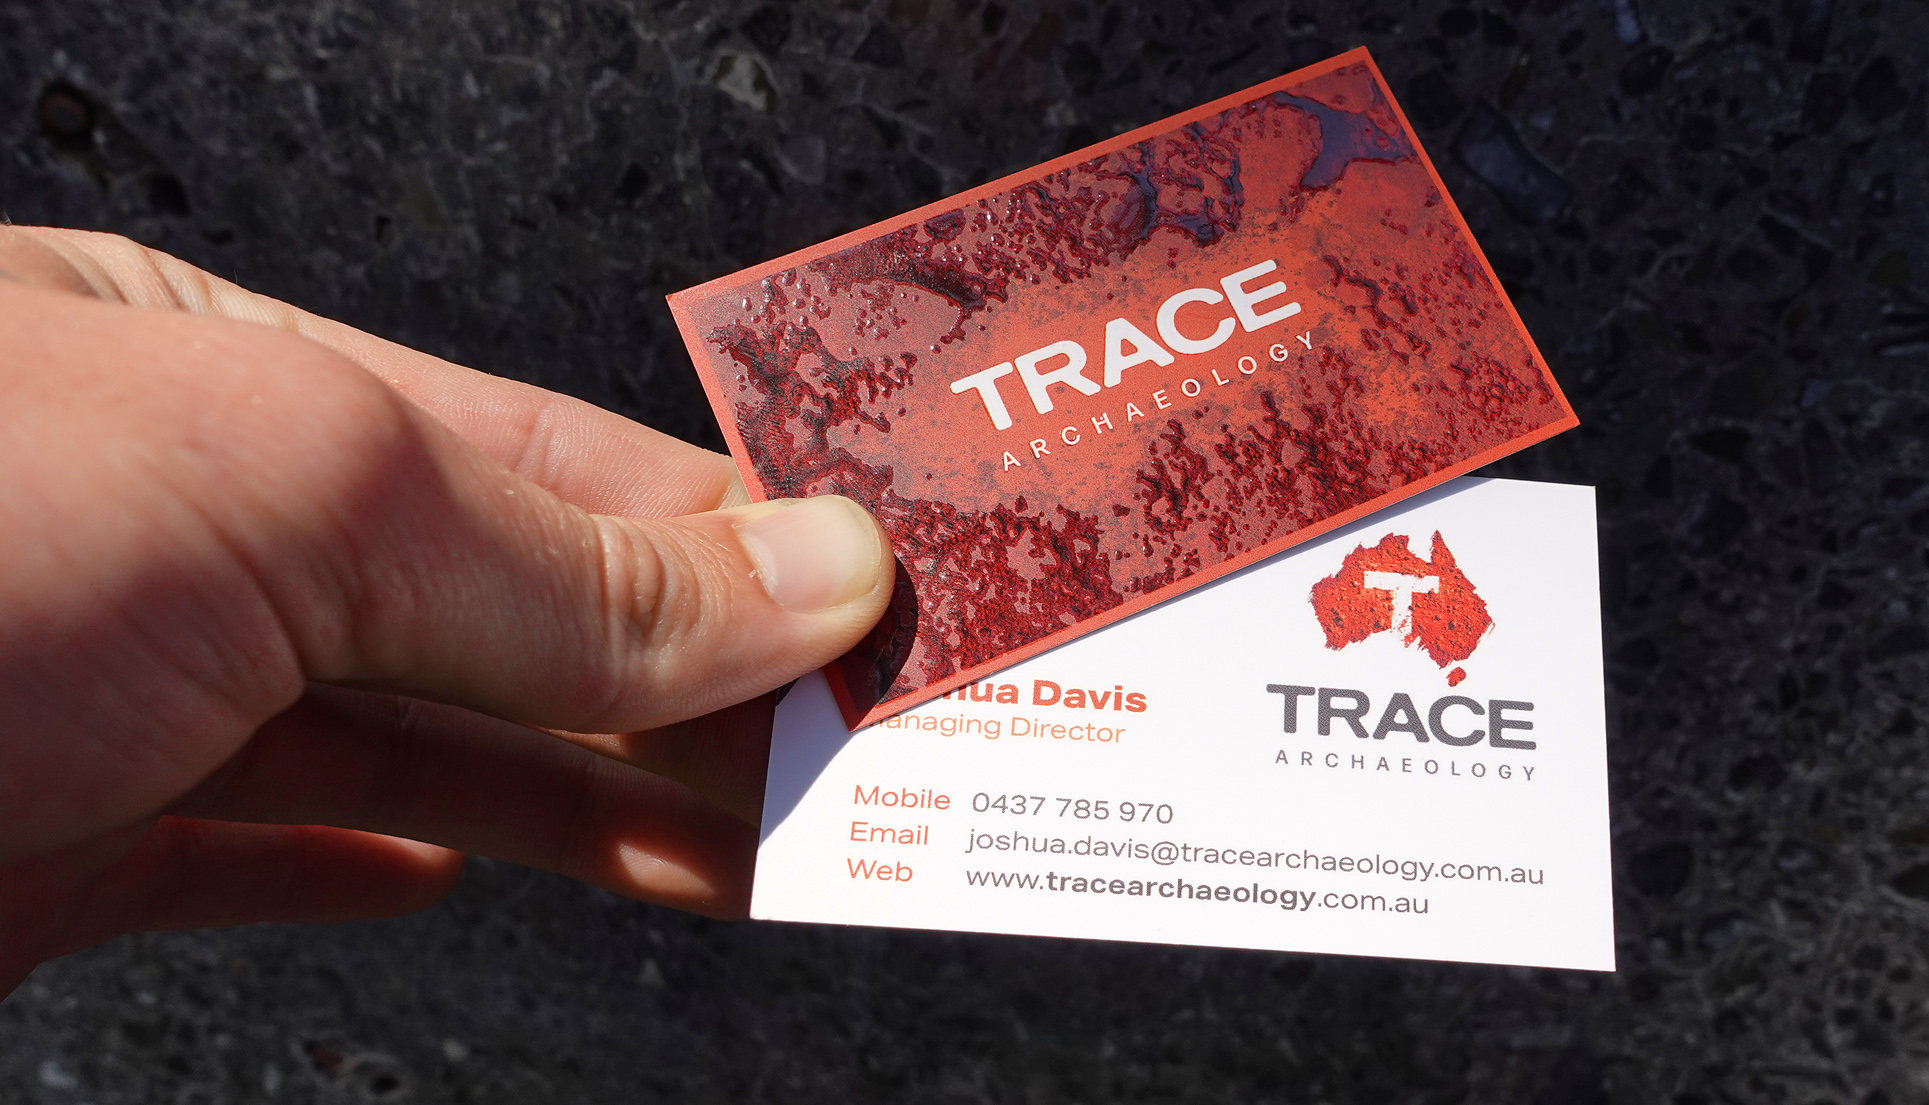 Trace Archaeology Branding